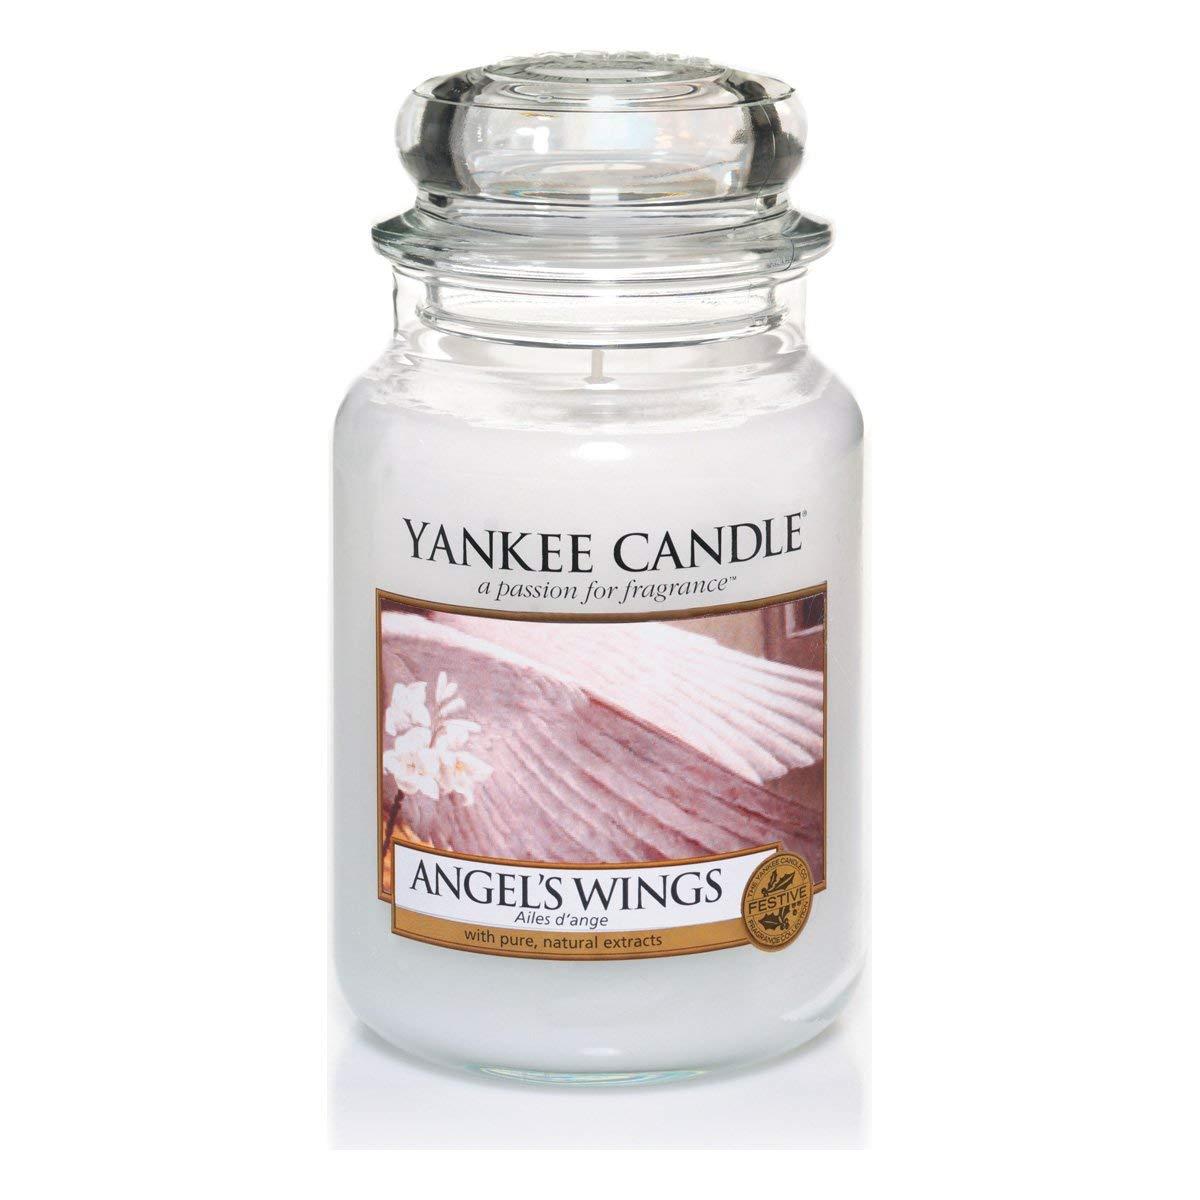 Angel's Wings - Yankee Candle - Large Jar